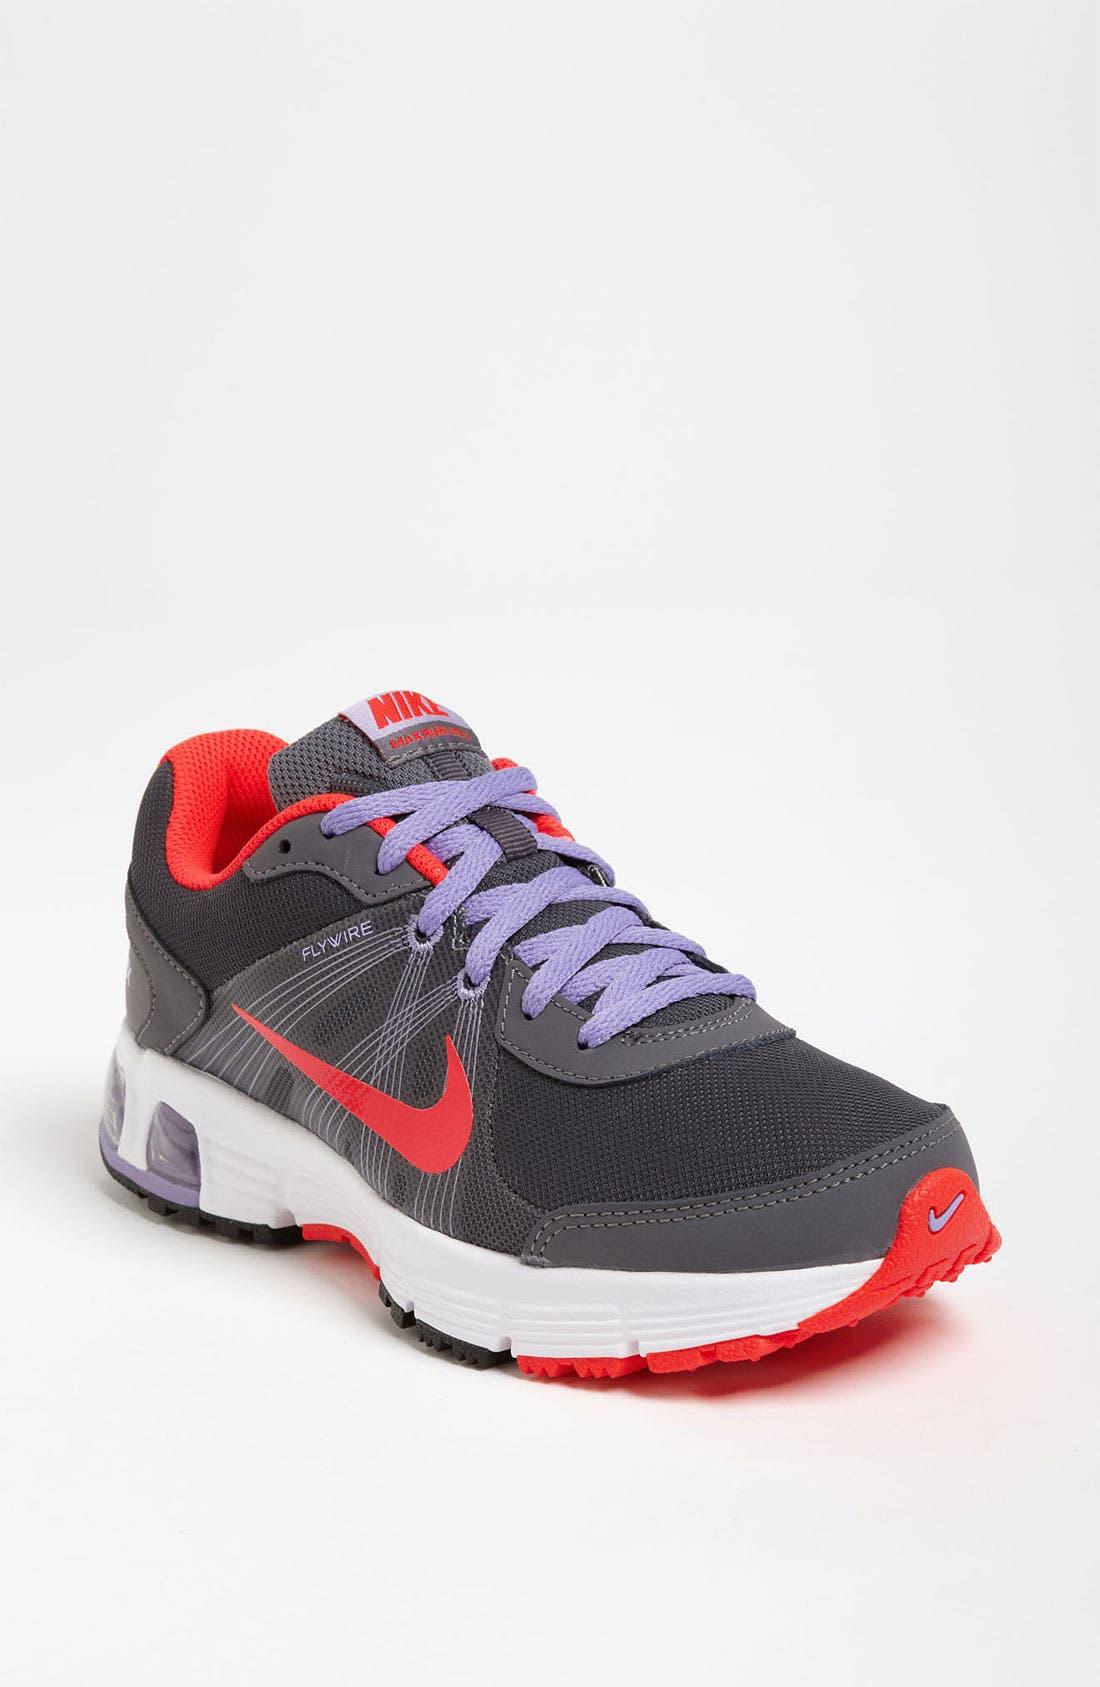 Alternate Image 1 Selected - Nike 'Air Max Run Lite 3' Running Shoe (Women)